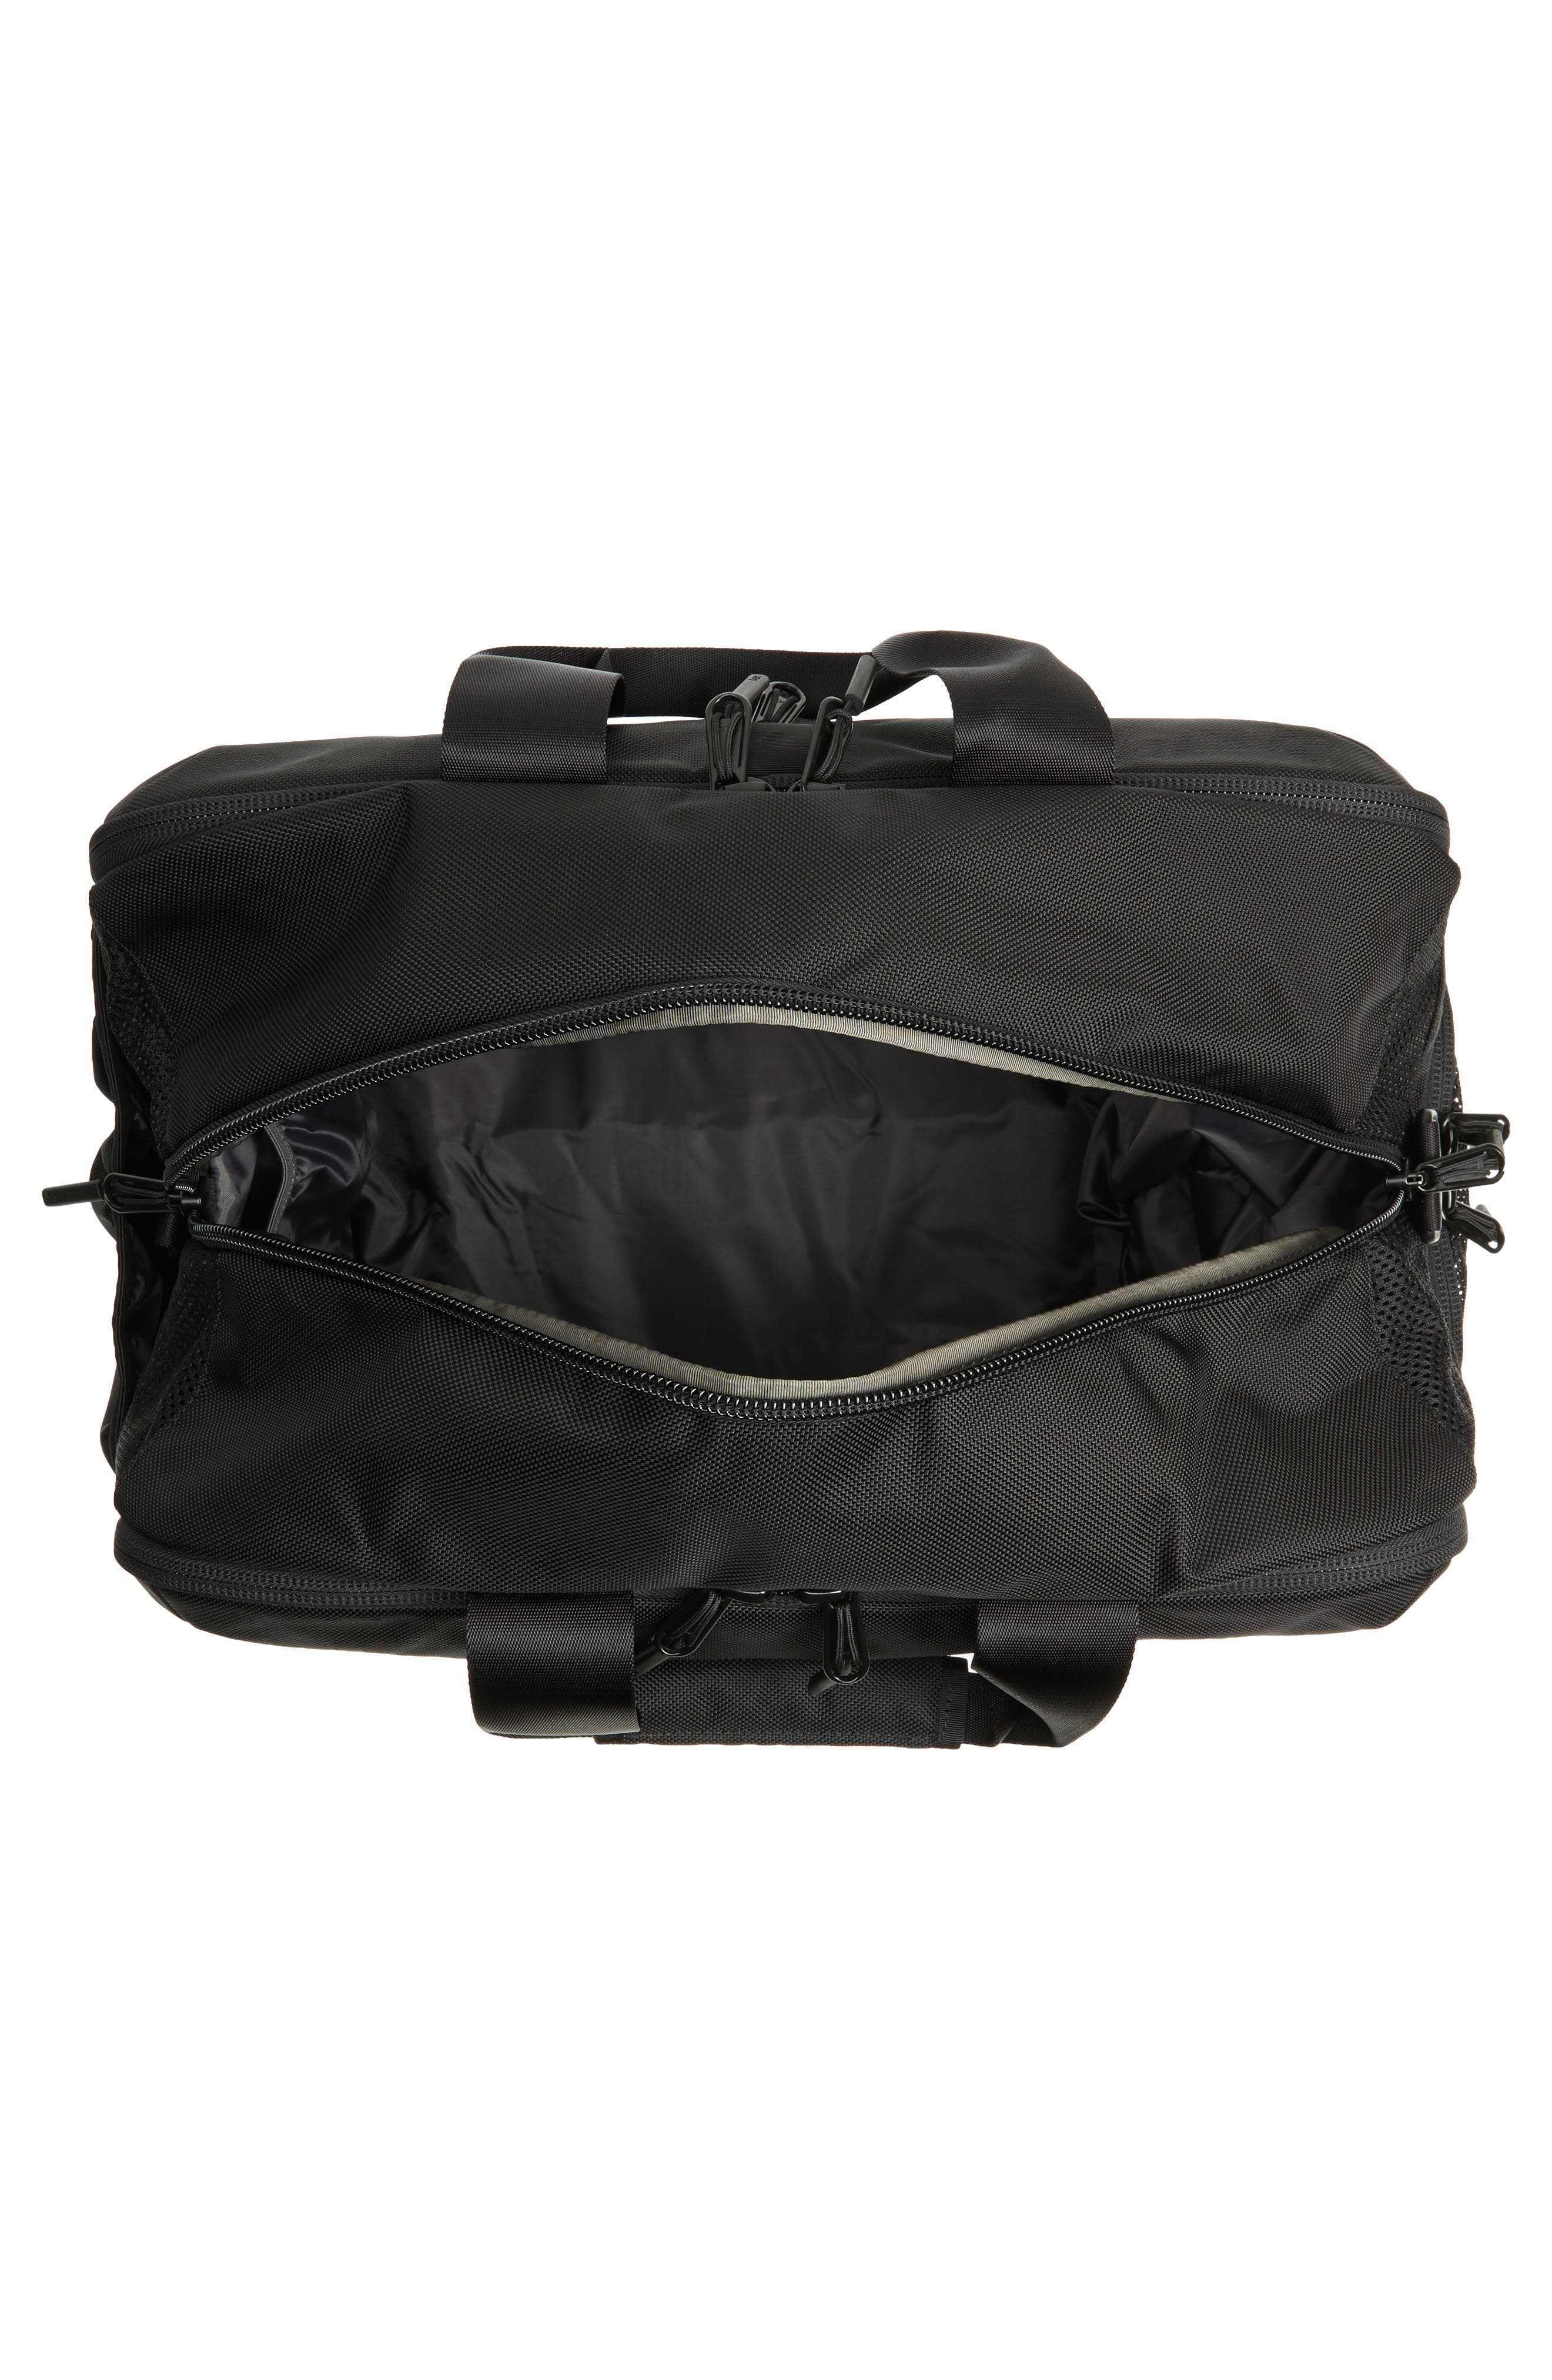 Gym Duffel 2 Bag,                             Alternate thumbnail 4, color,                             Black